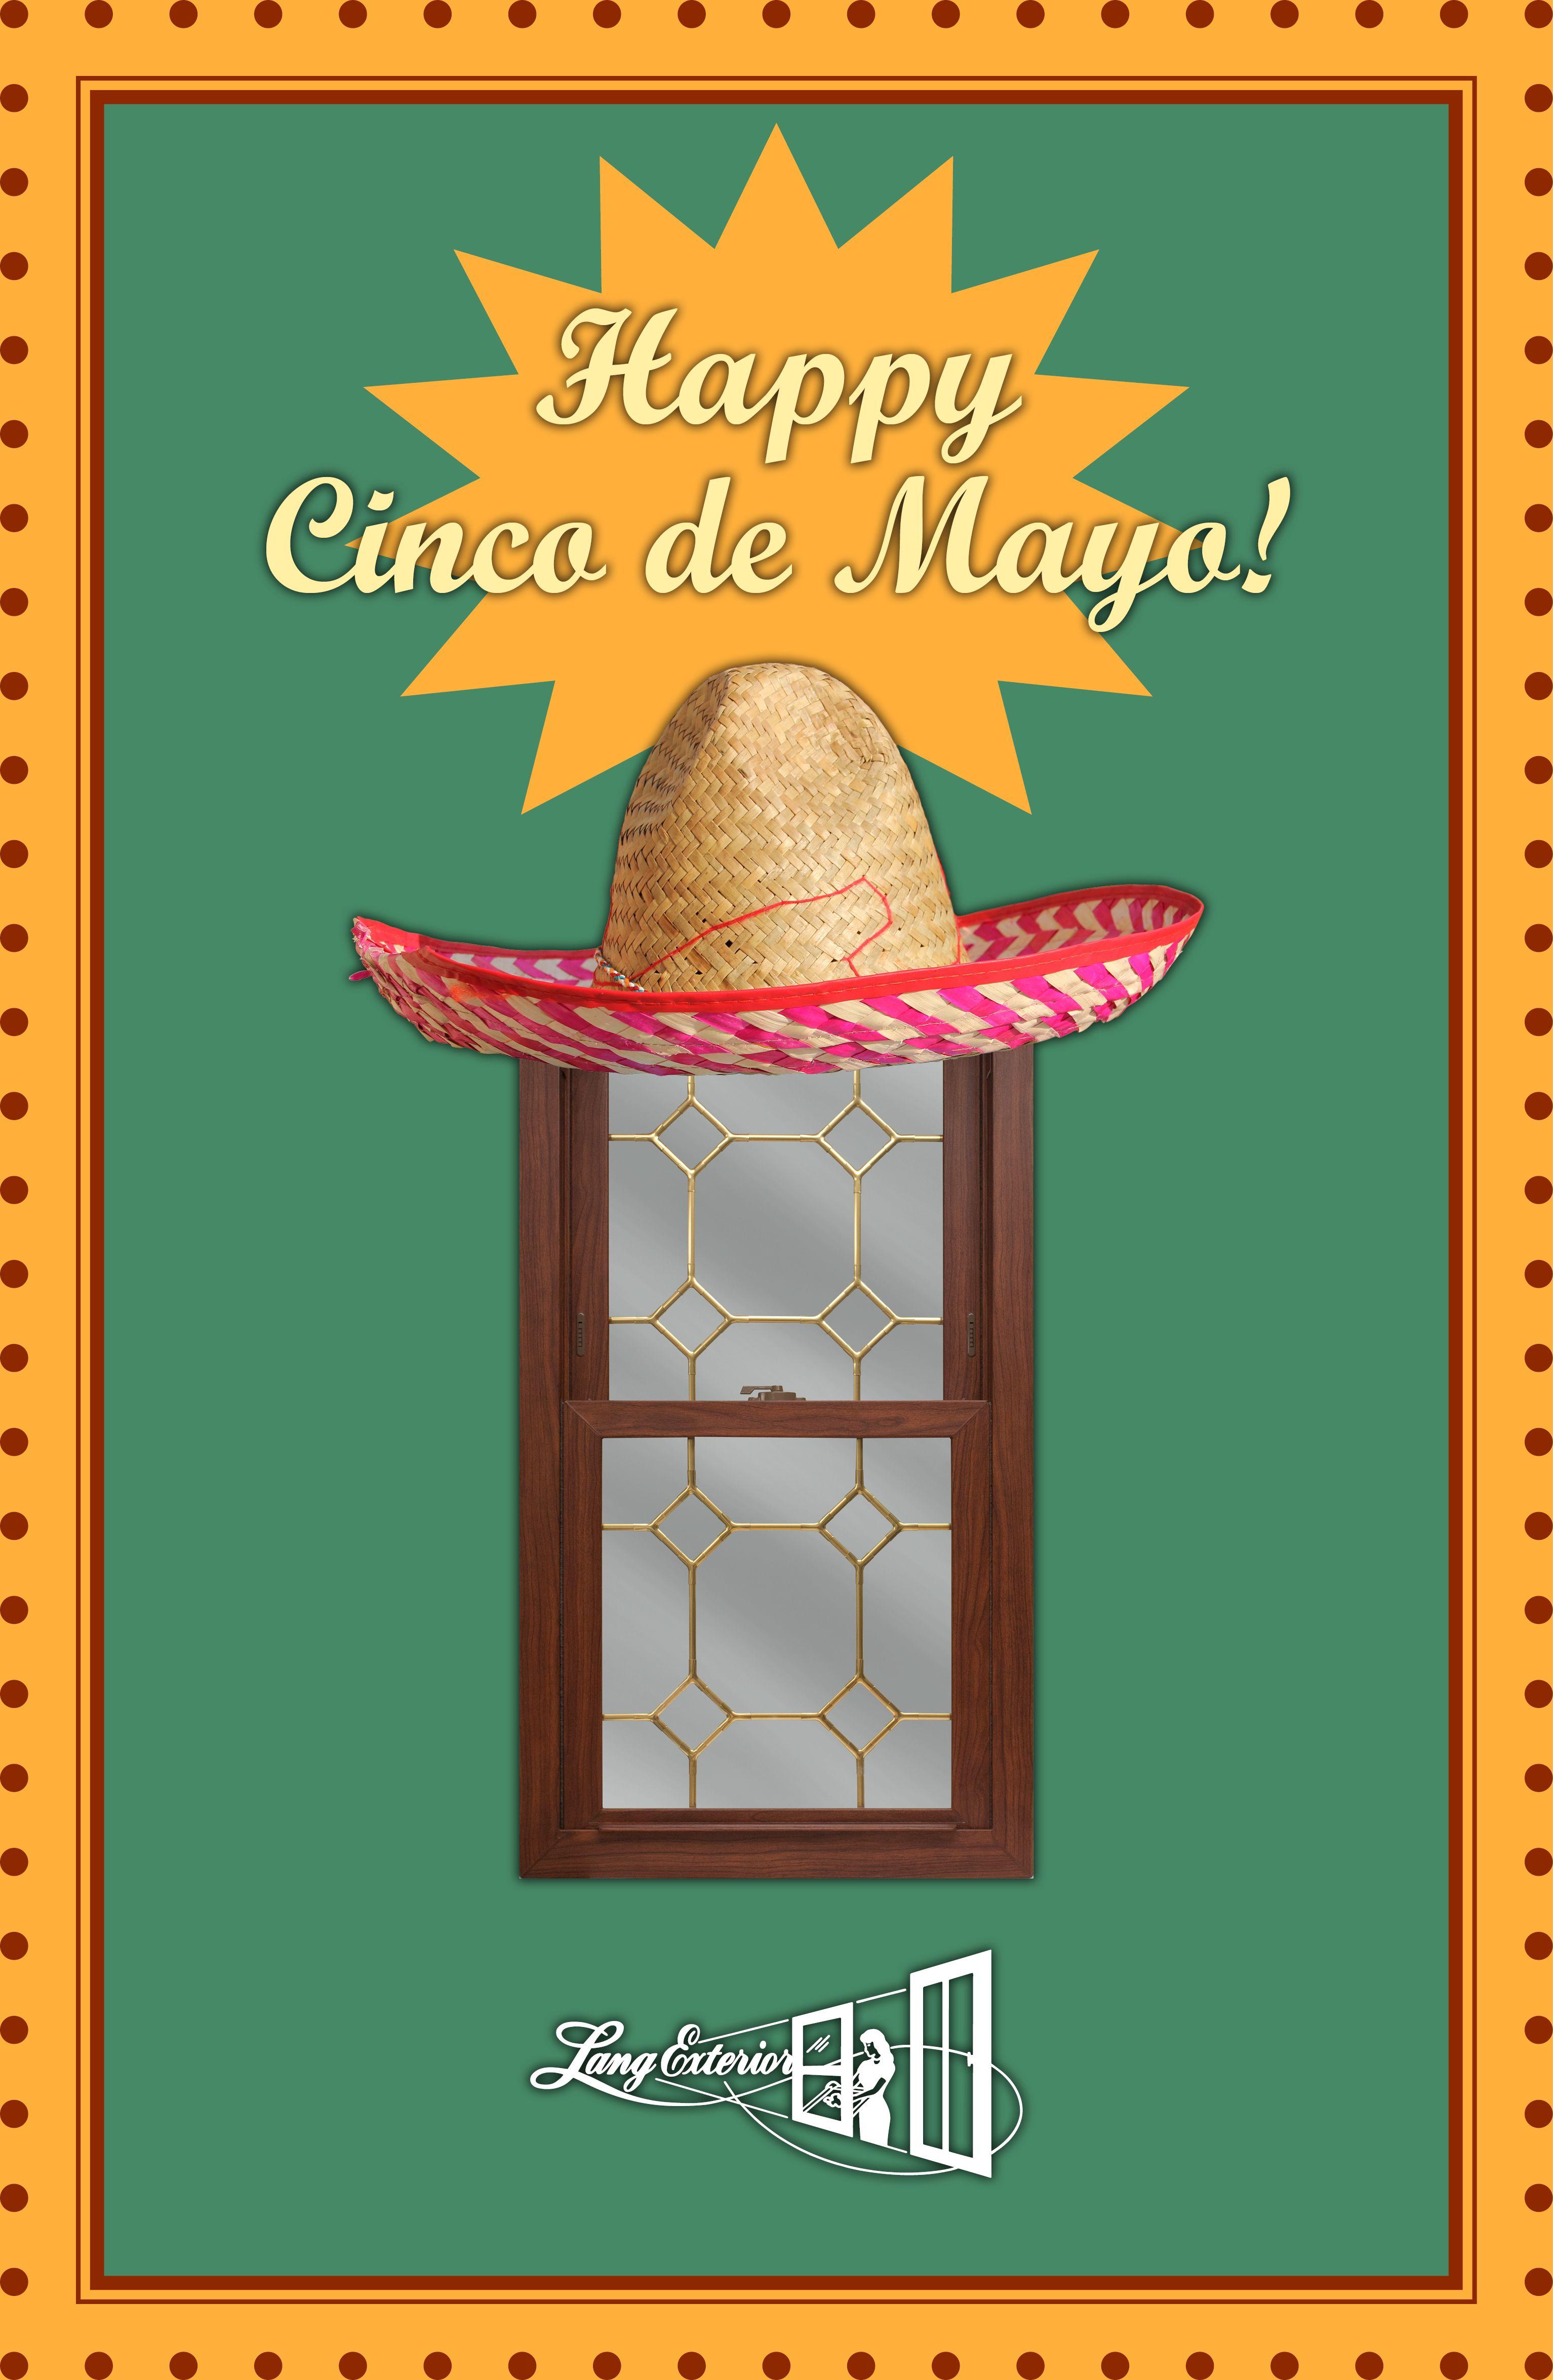 Happy Cinco de Mayo from Lang Exterior! LangExterior